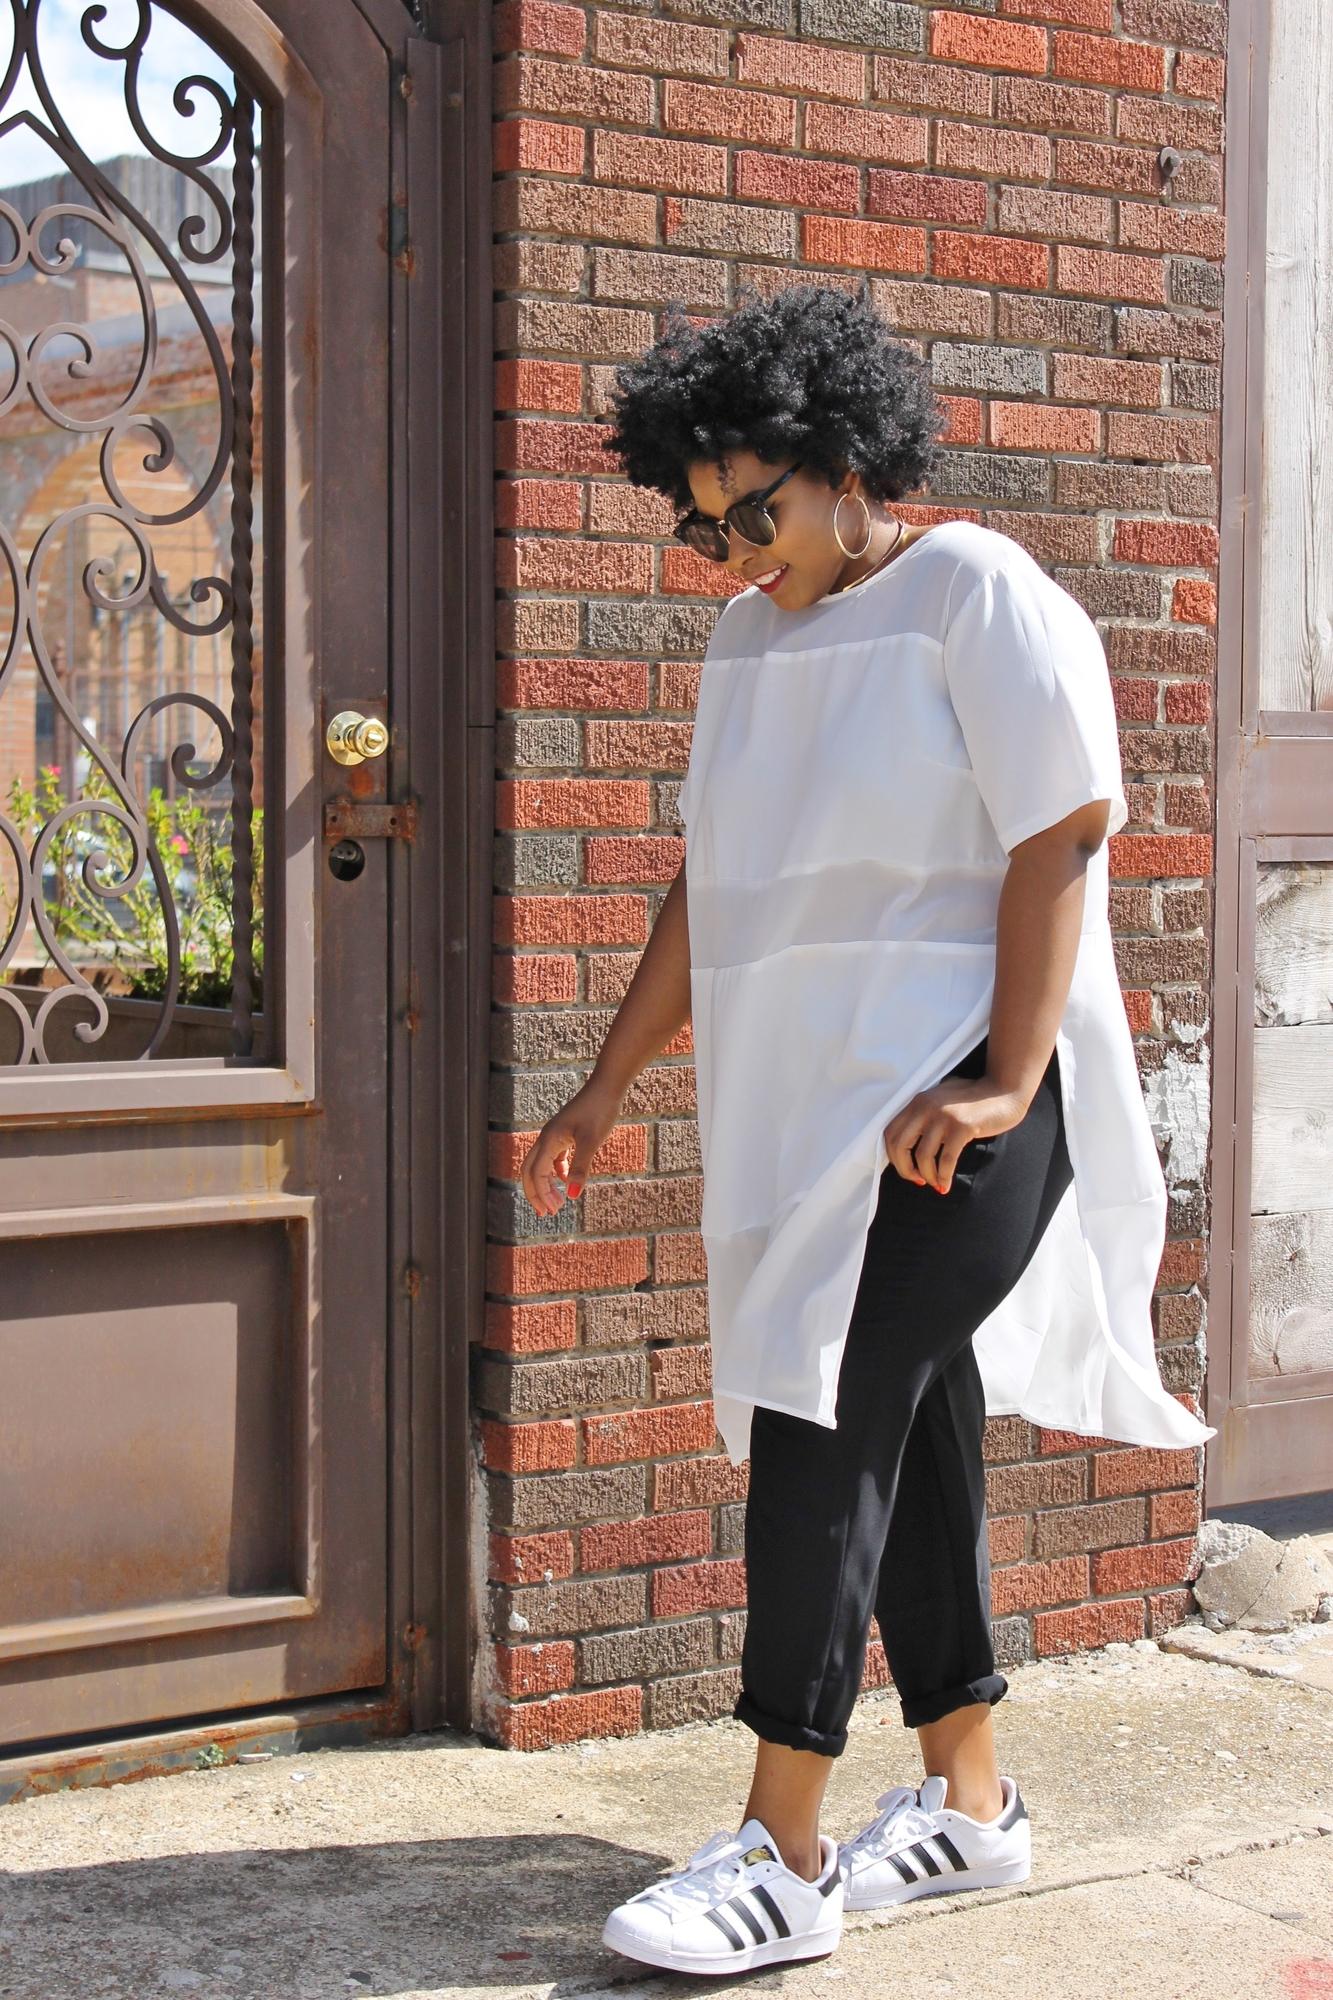 black style blogger walking in white dress